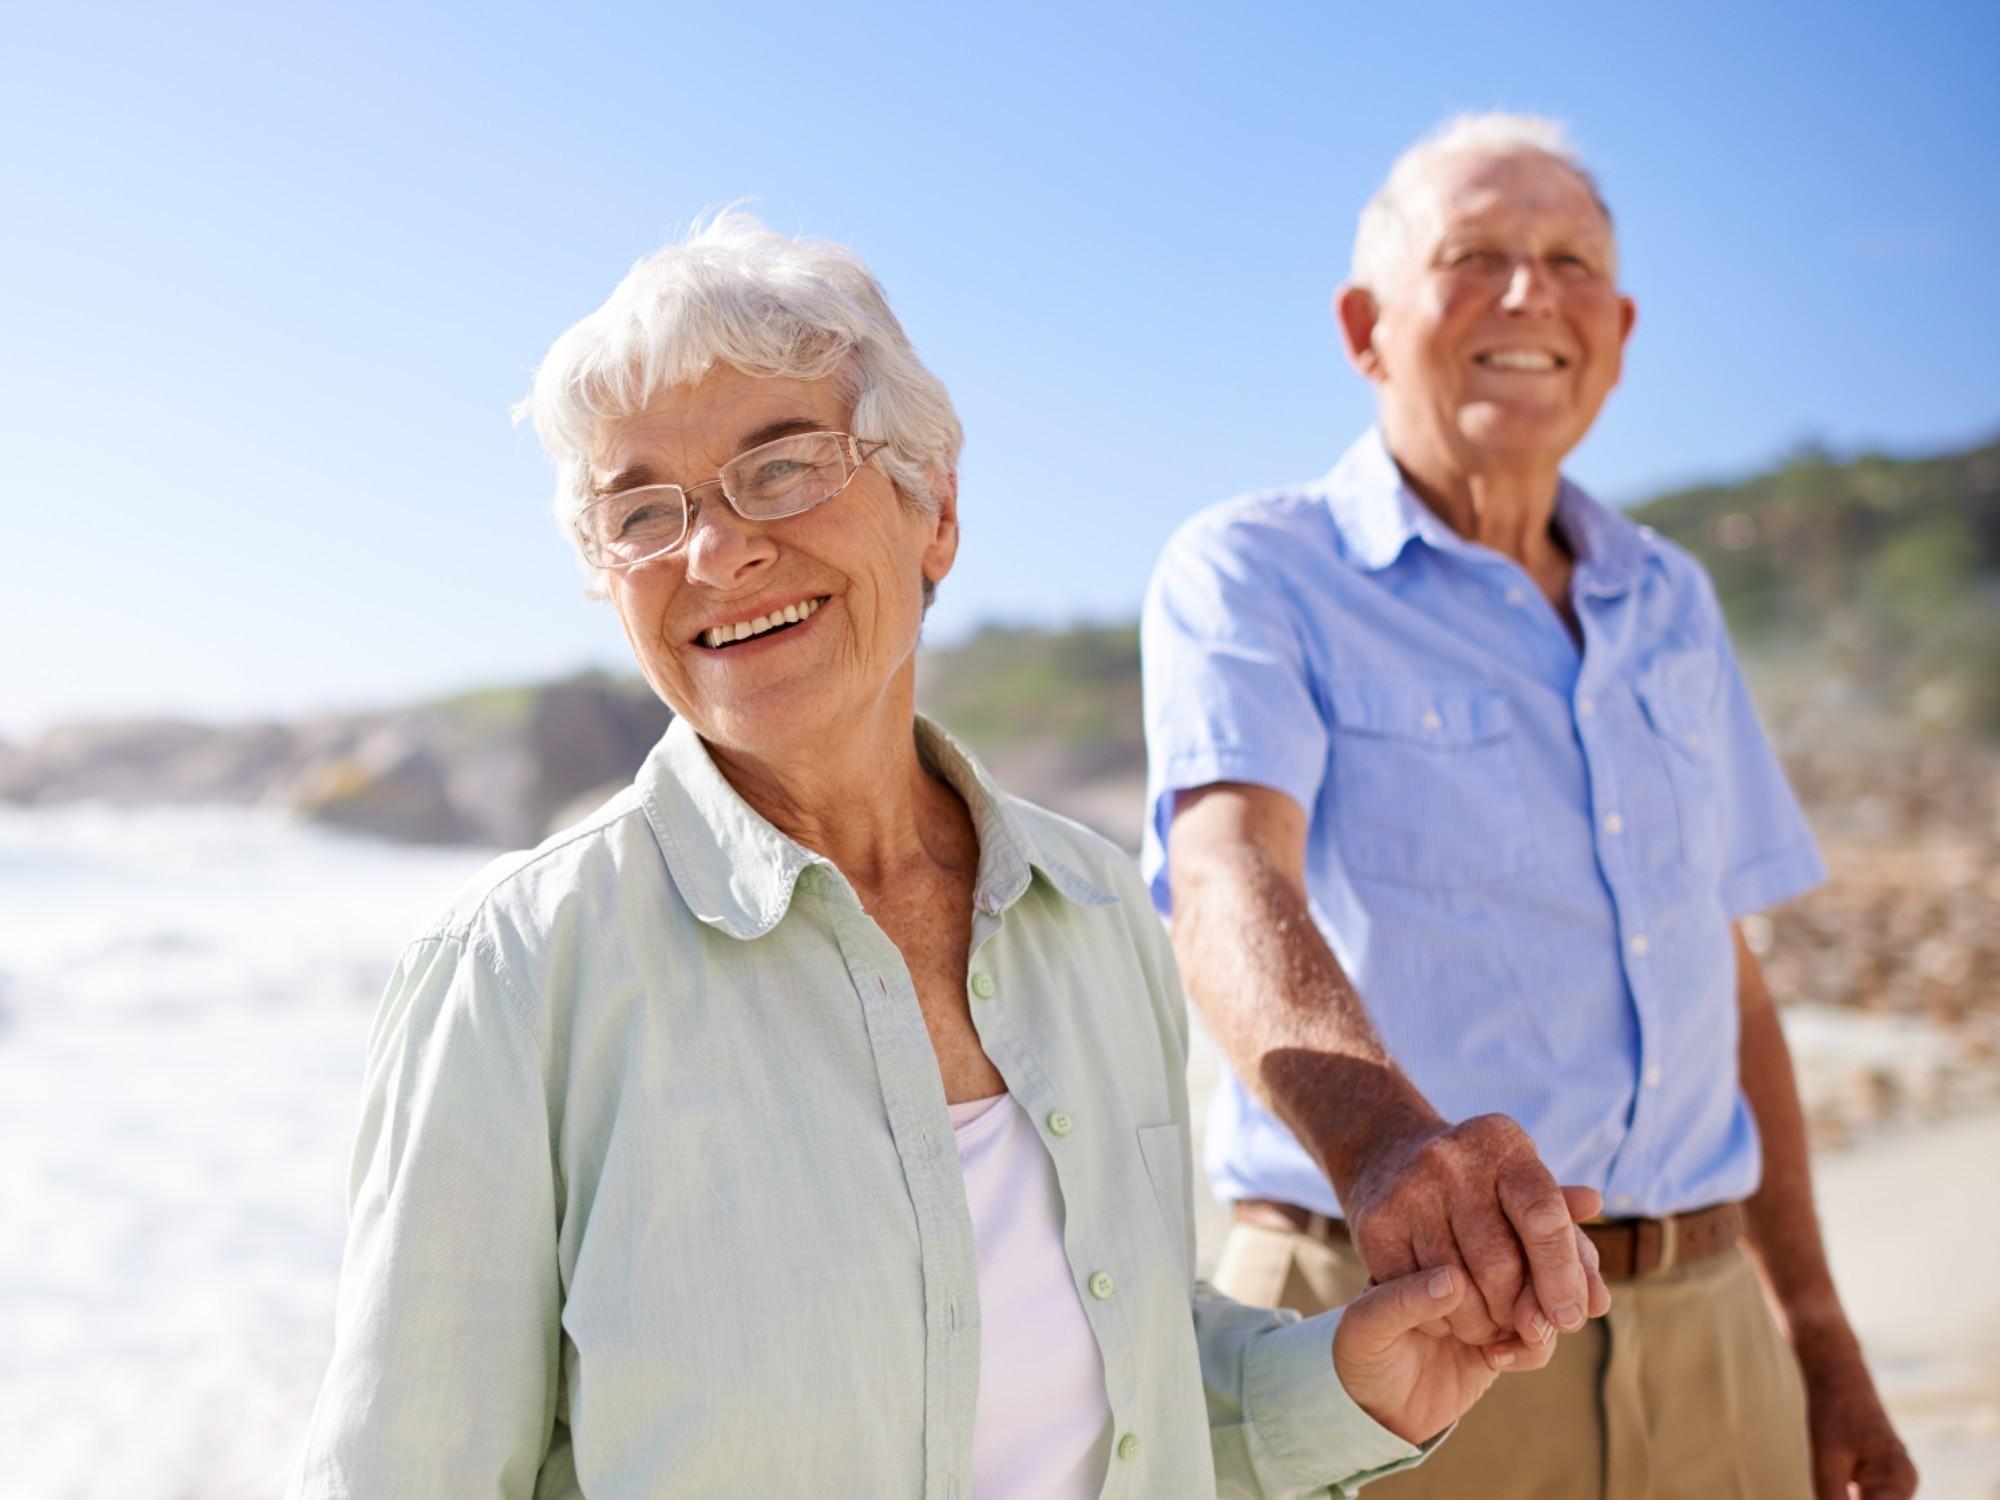 Older couple enjoying themselves on the beach